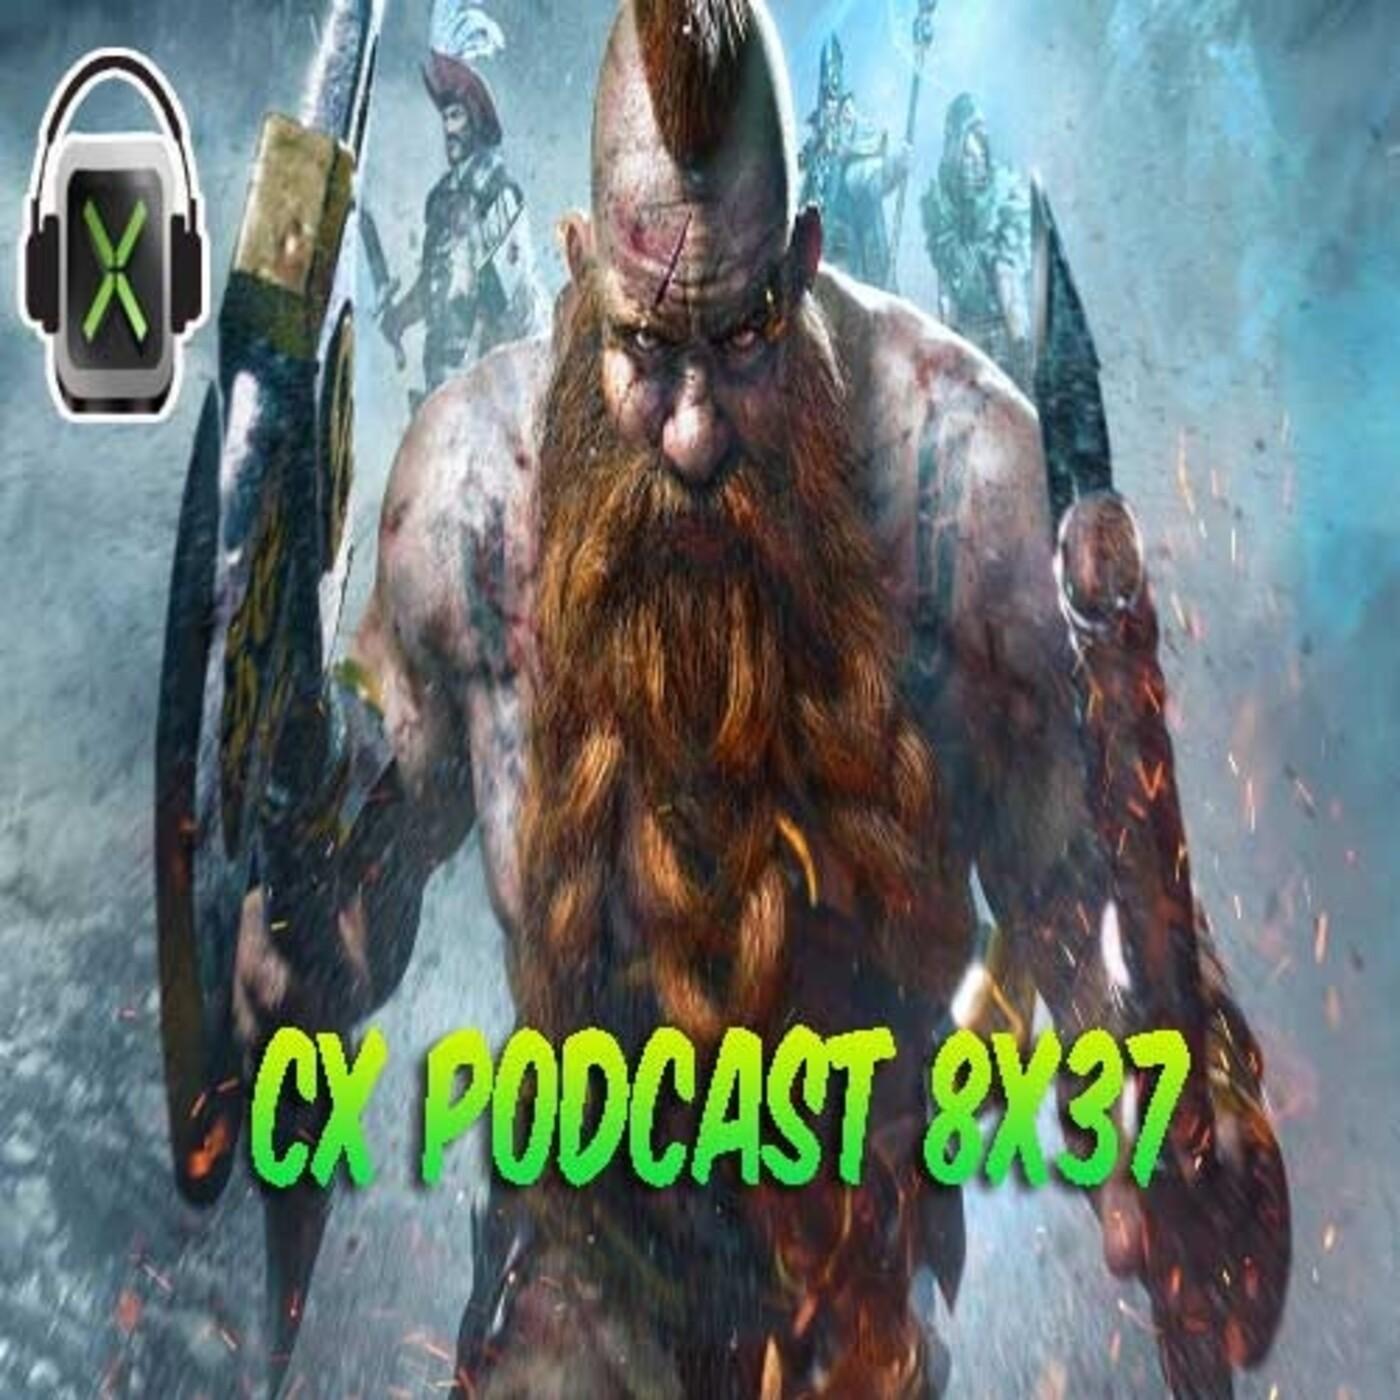 CX Podcast 8x37 I Warhammer, expectativas del E3 2021